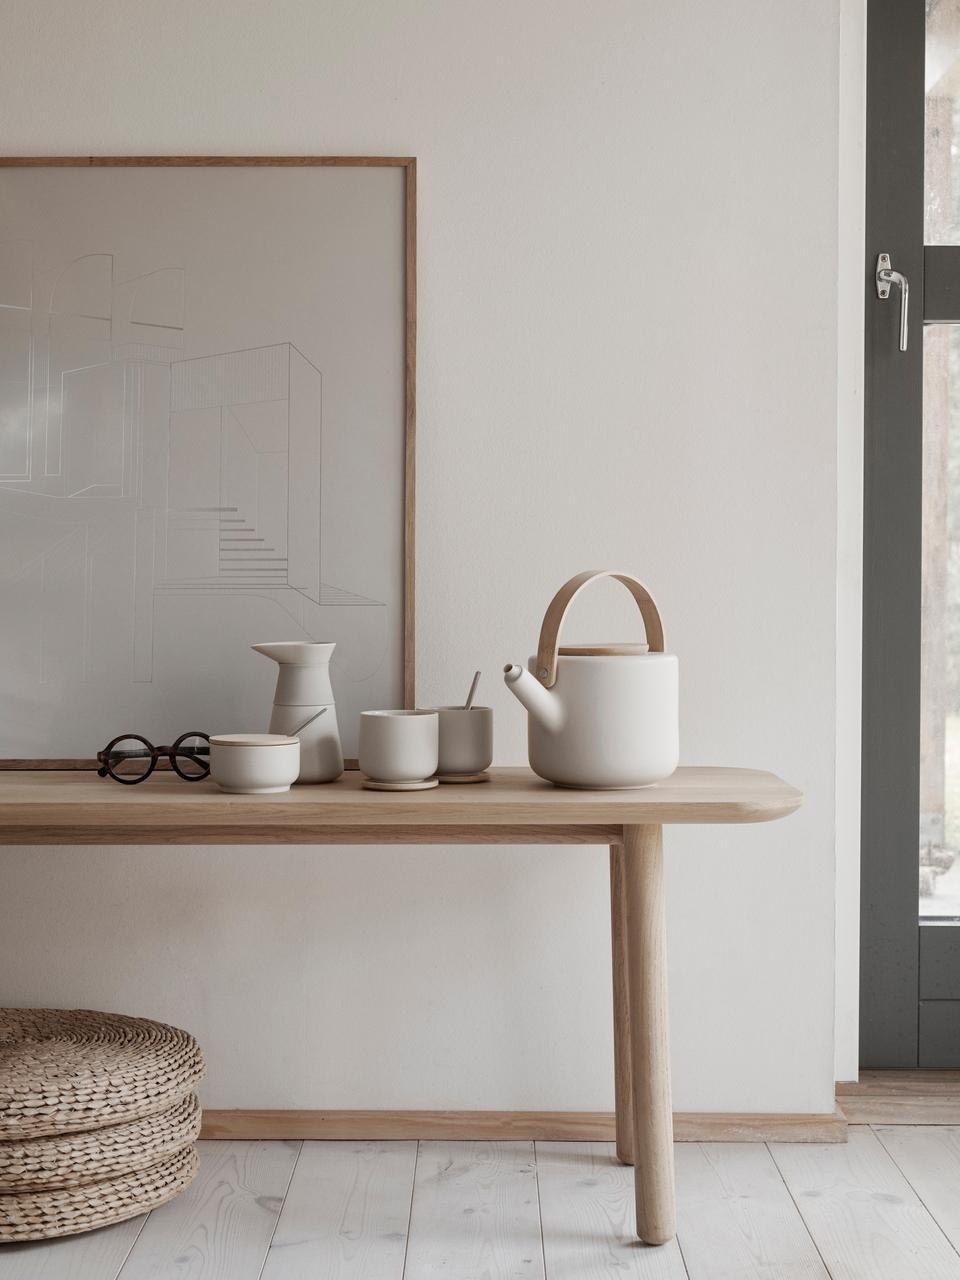 Teiera in gres bianco opaco Theo, 1.25 L, Brocca: gres, Bianco latteo, bambù, 1.25 L